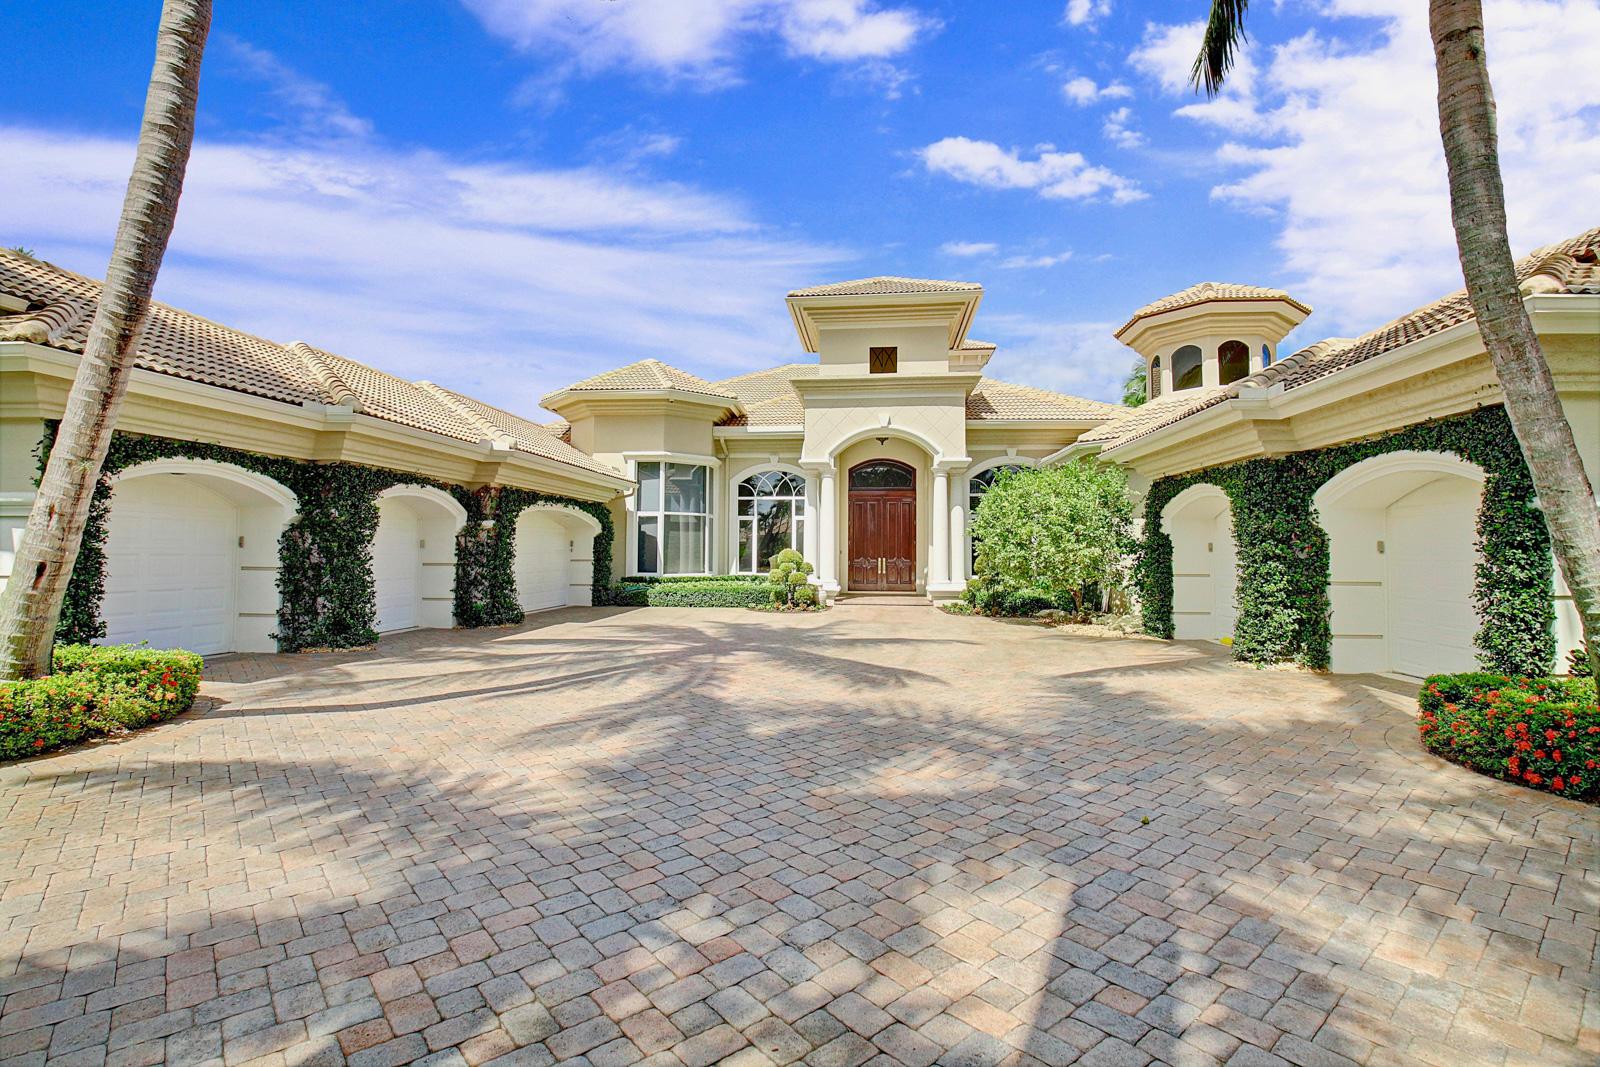 305 Grand Key Terrace Terrace, Palm Beach Gardens, Florida 33418, 4 Bedrooms Bedrooms, ,5.2 BathroomsBathrooms,A,Single family,Grand Key Terrace,RX-10480573